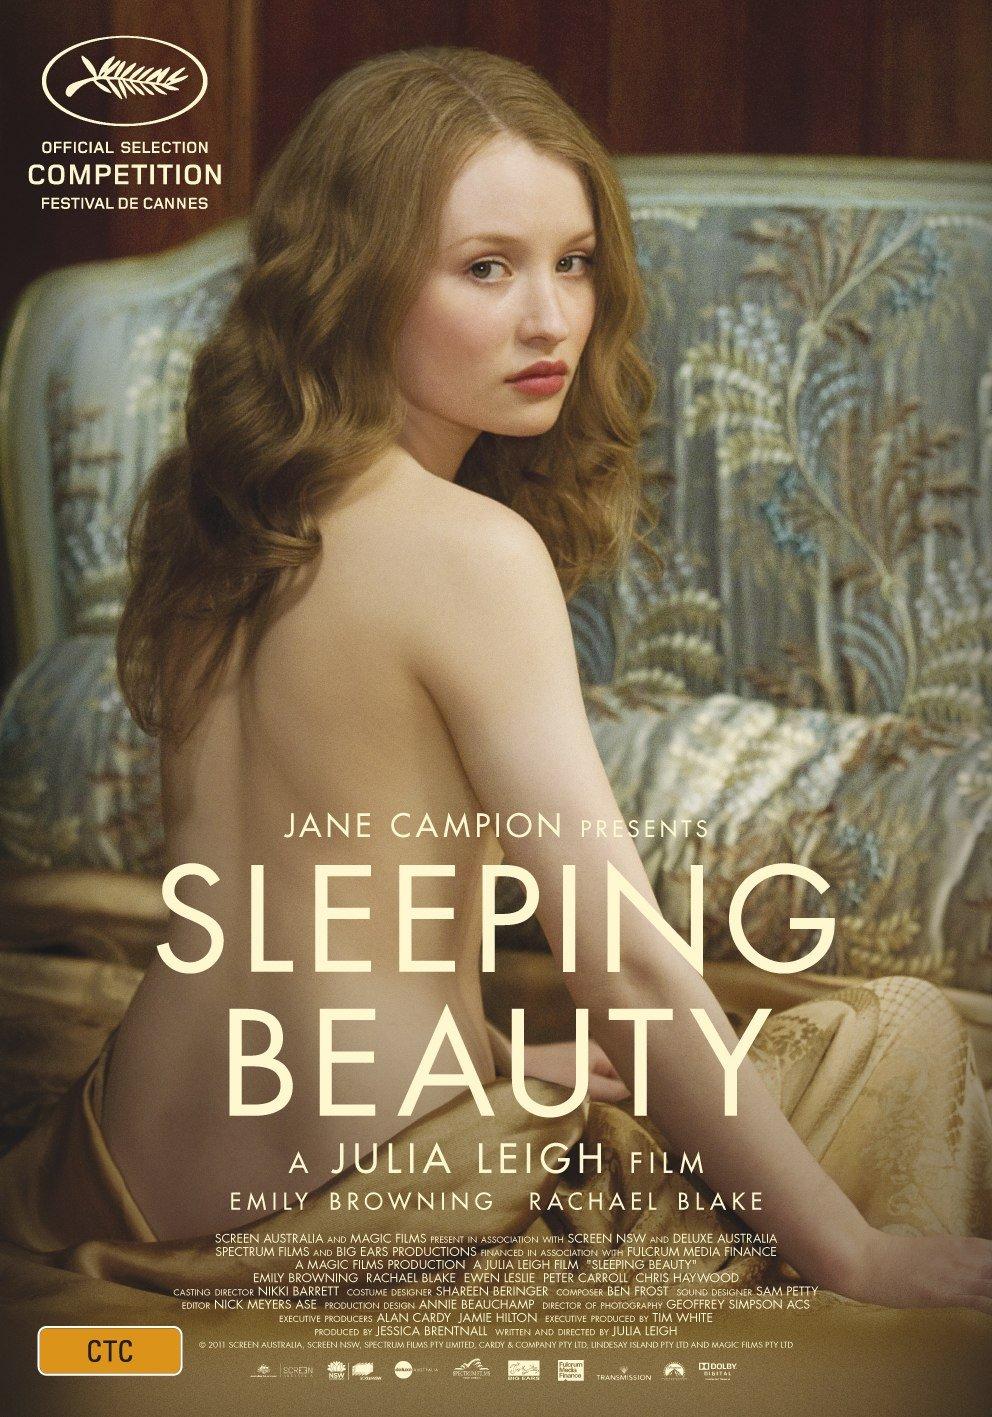 Sleeping Beauty movie